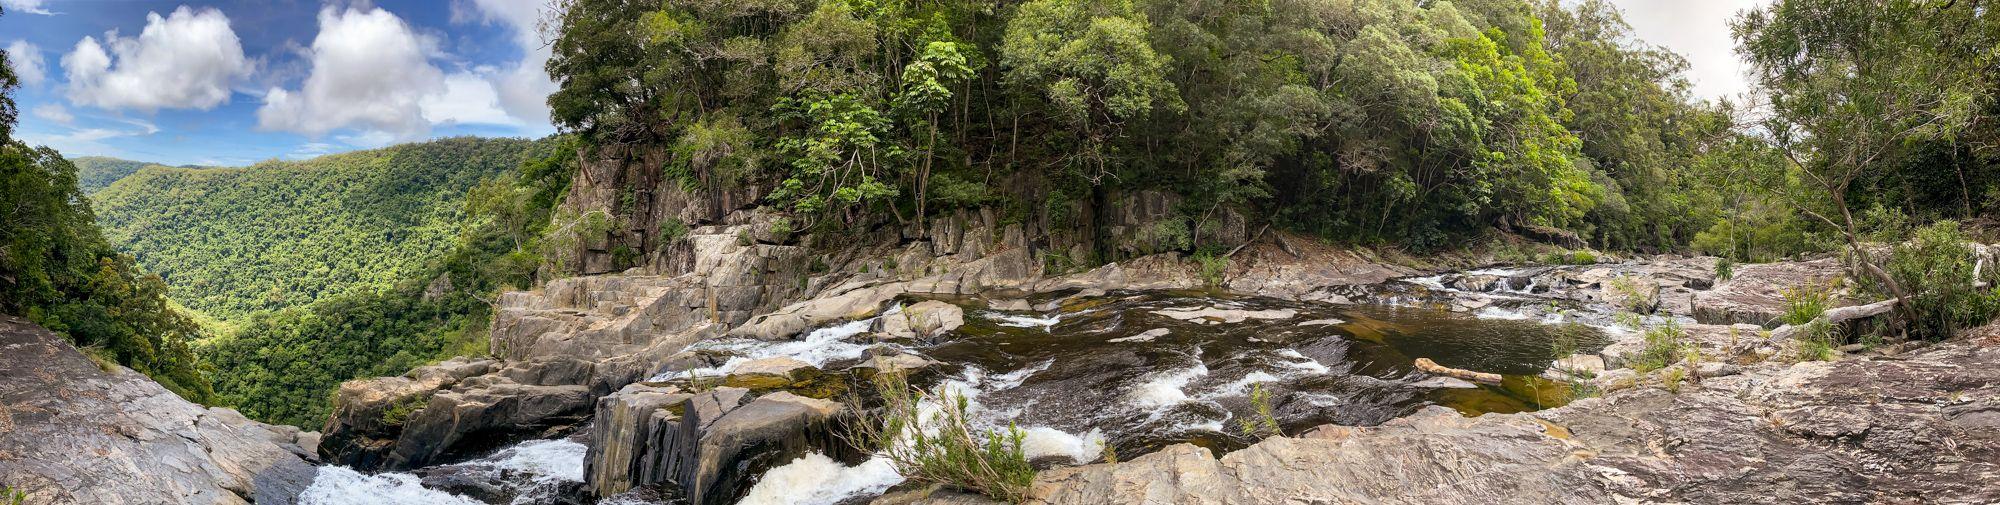 spring creek top pano